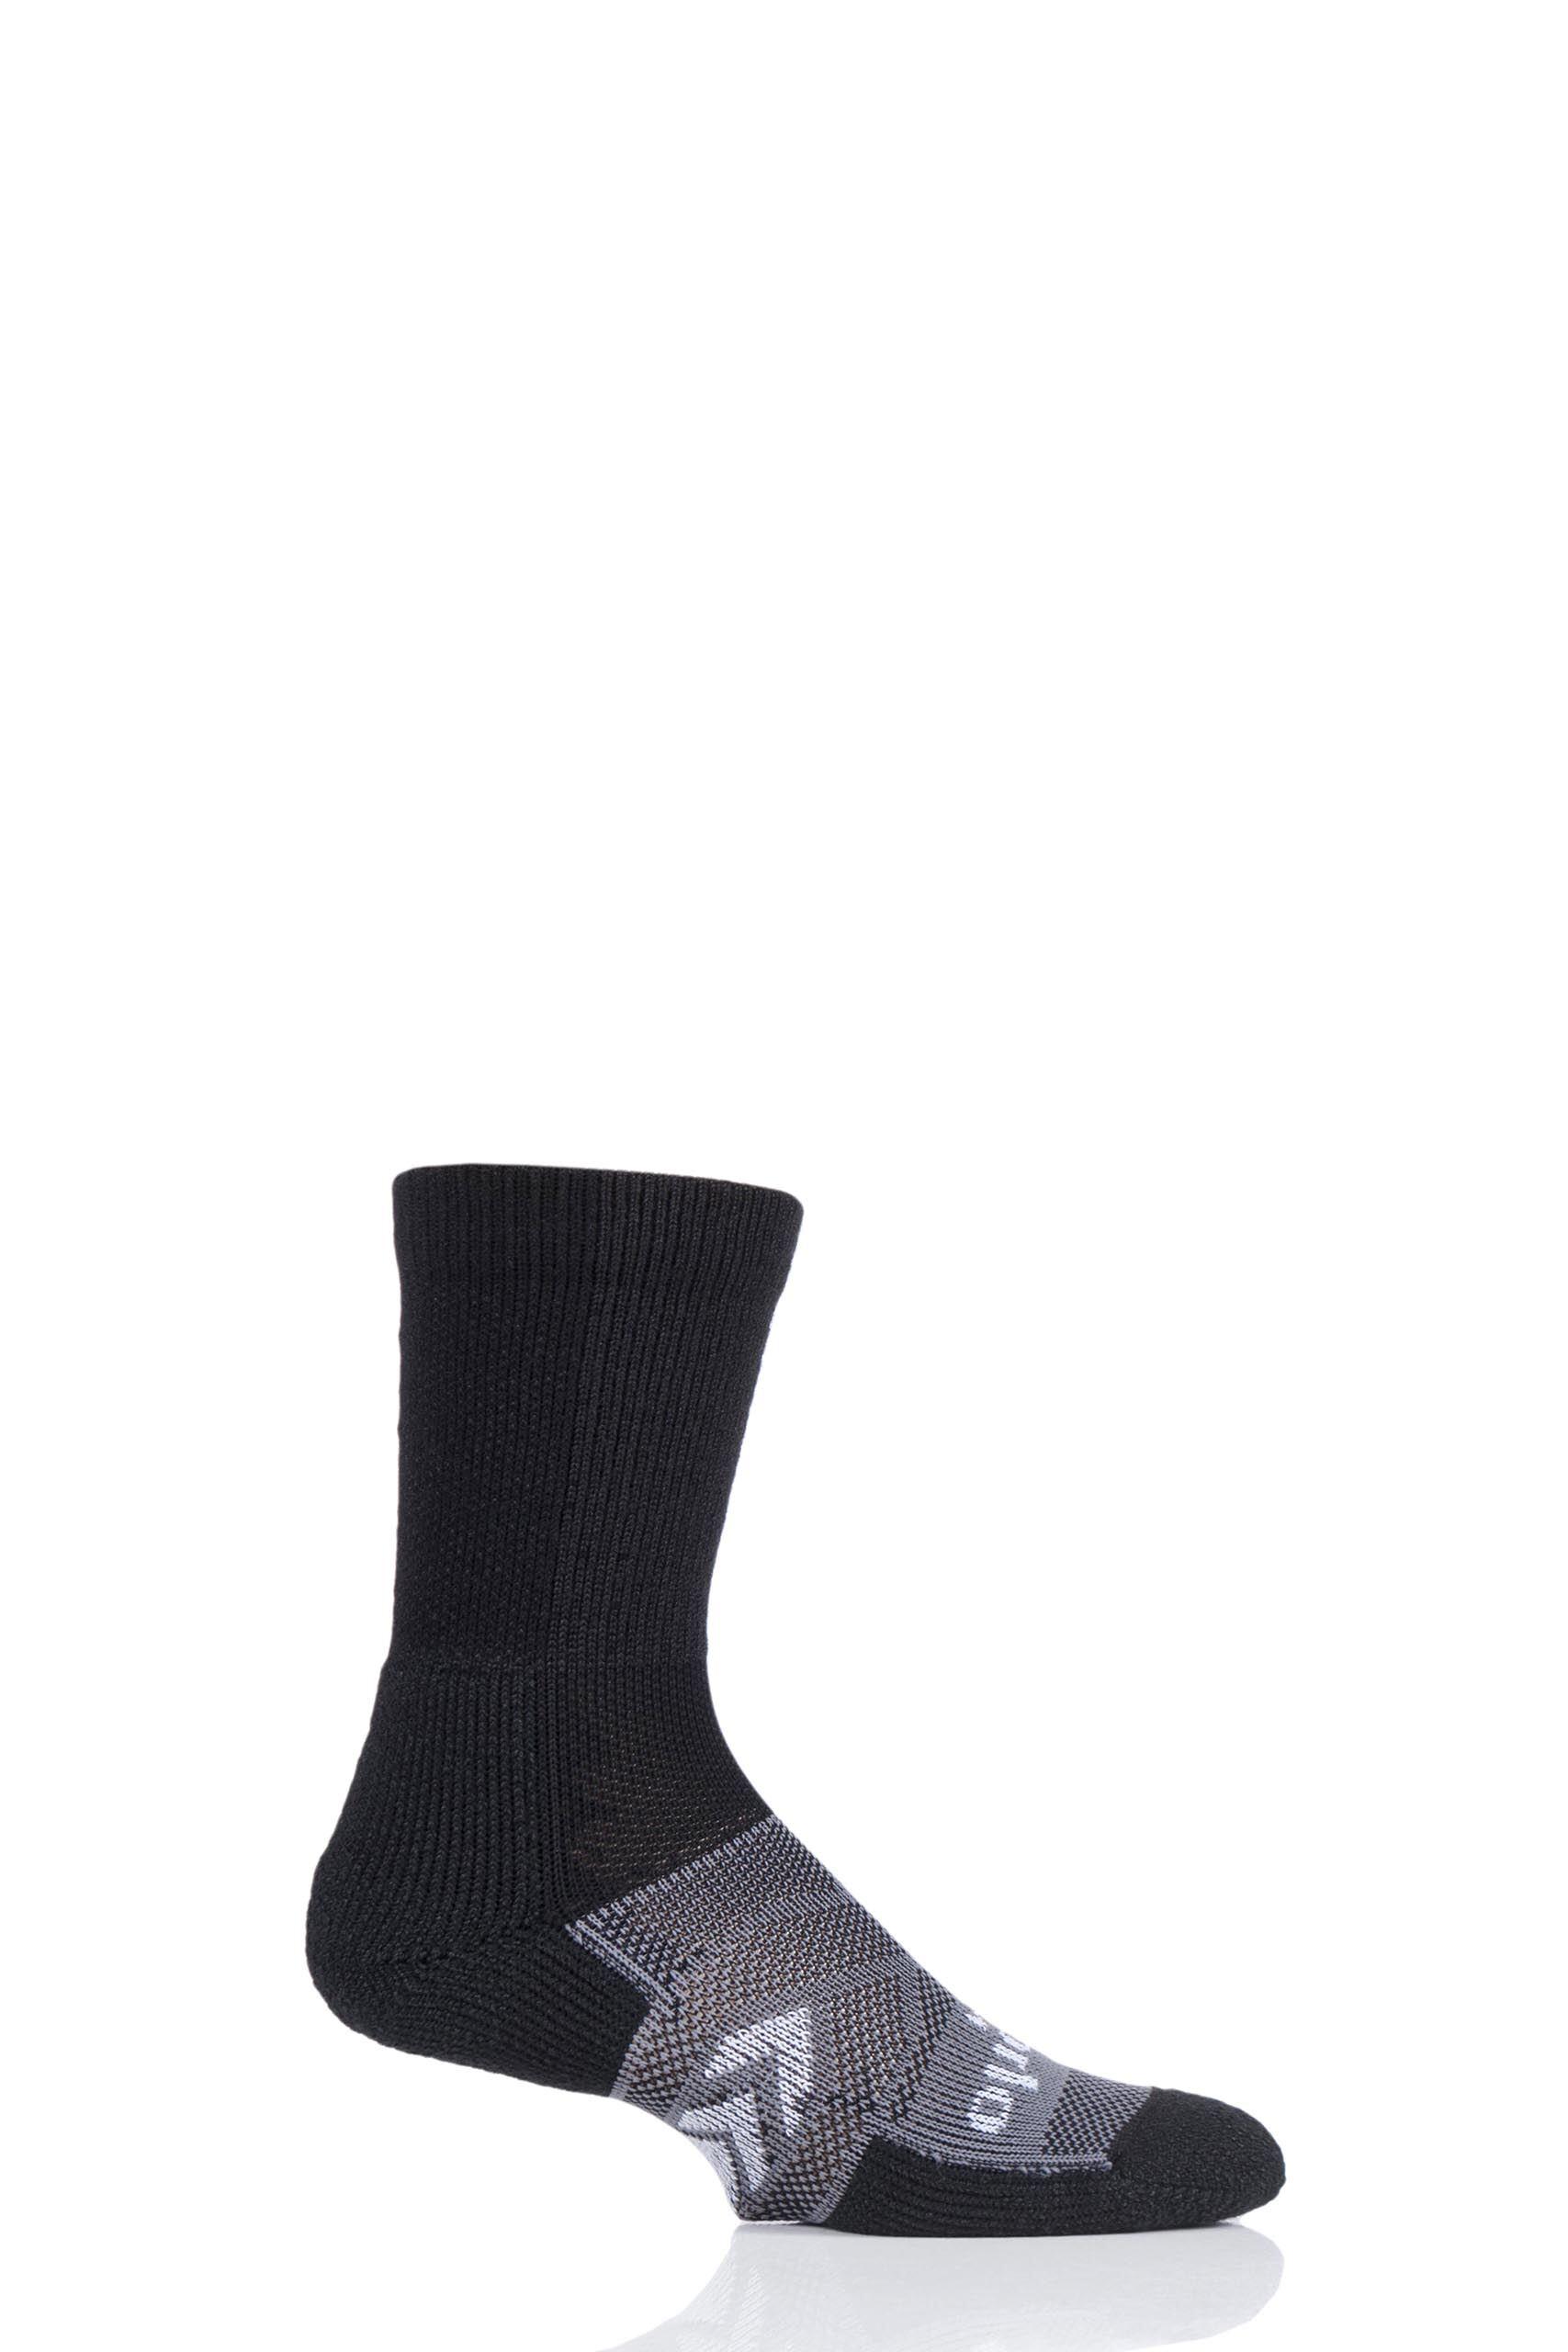 Image of 1 Pair Black 12 Hour Shift Work Socks Unisex 5.5-8.5 Mens - Thorlos